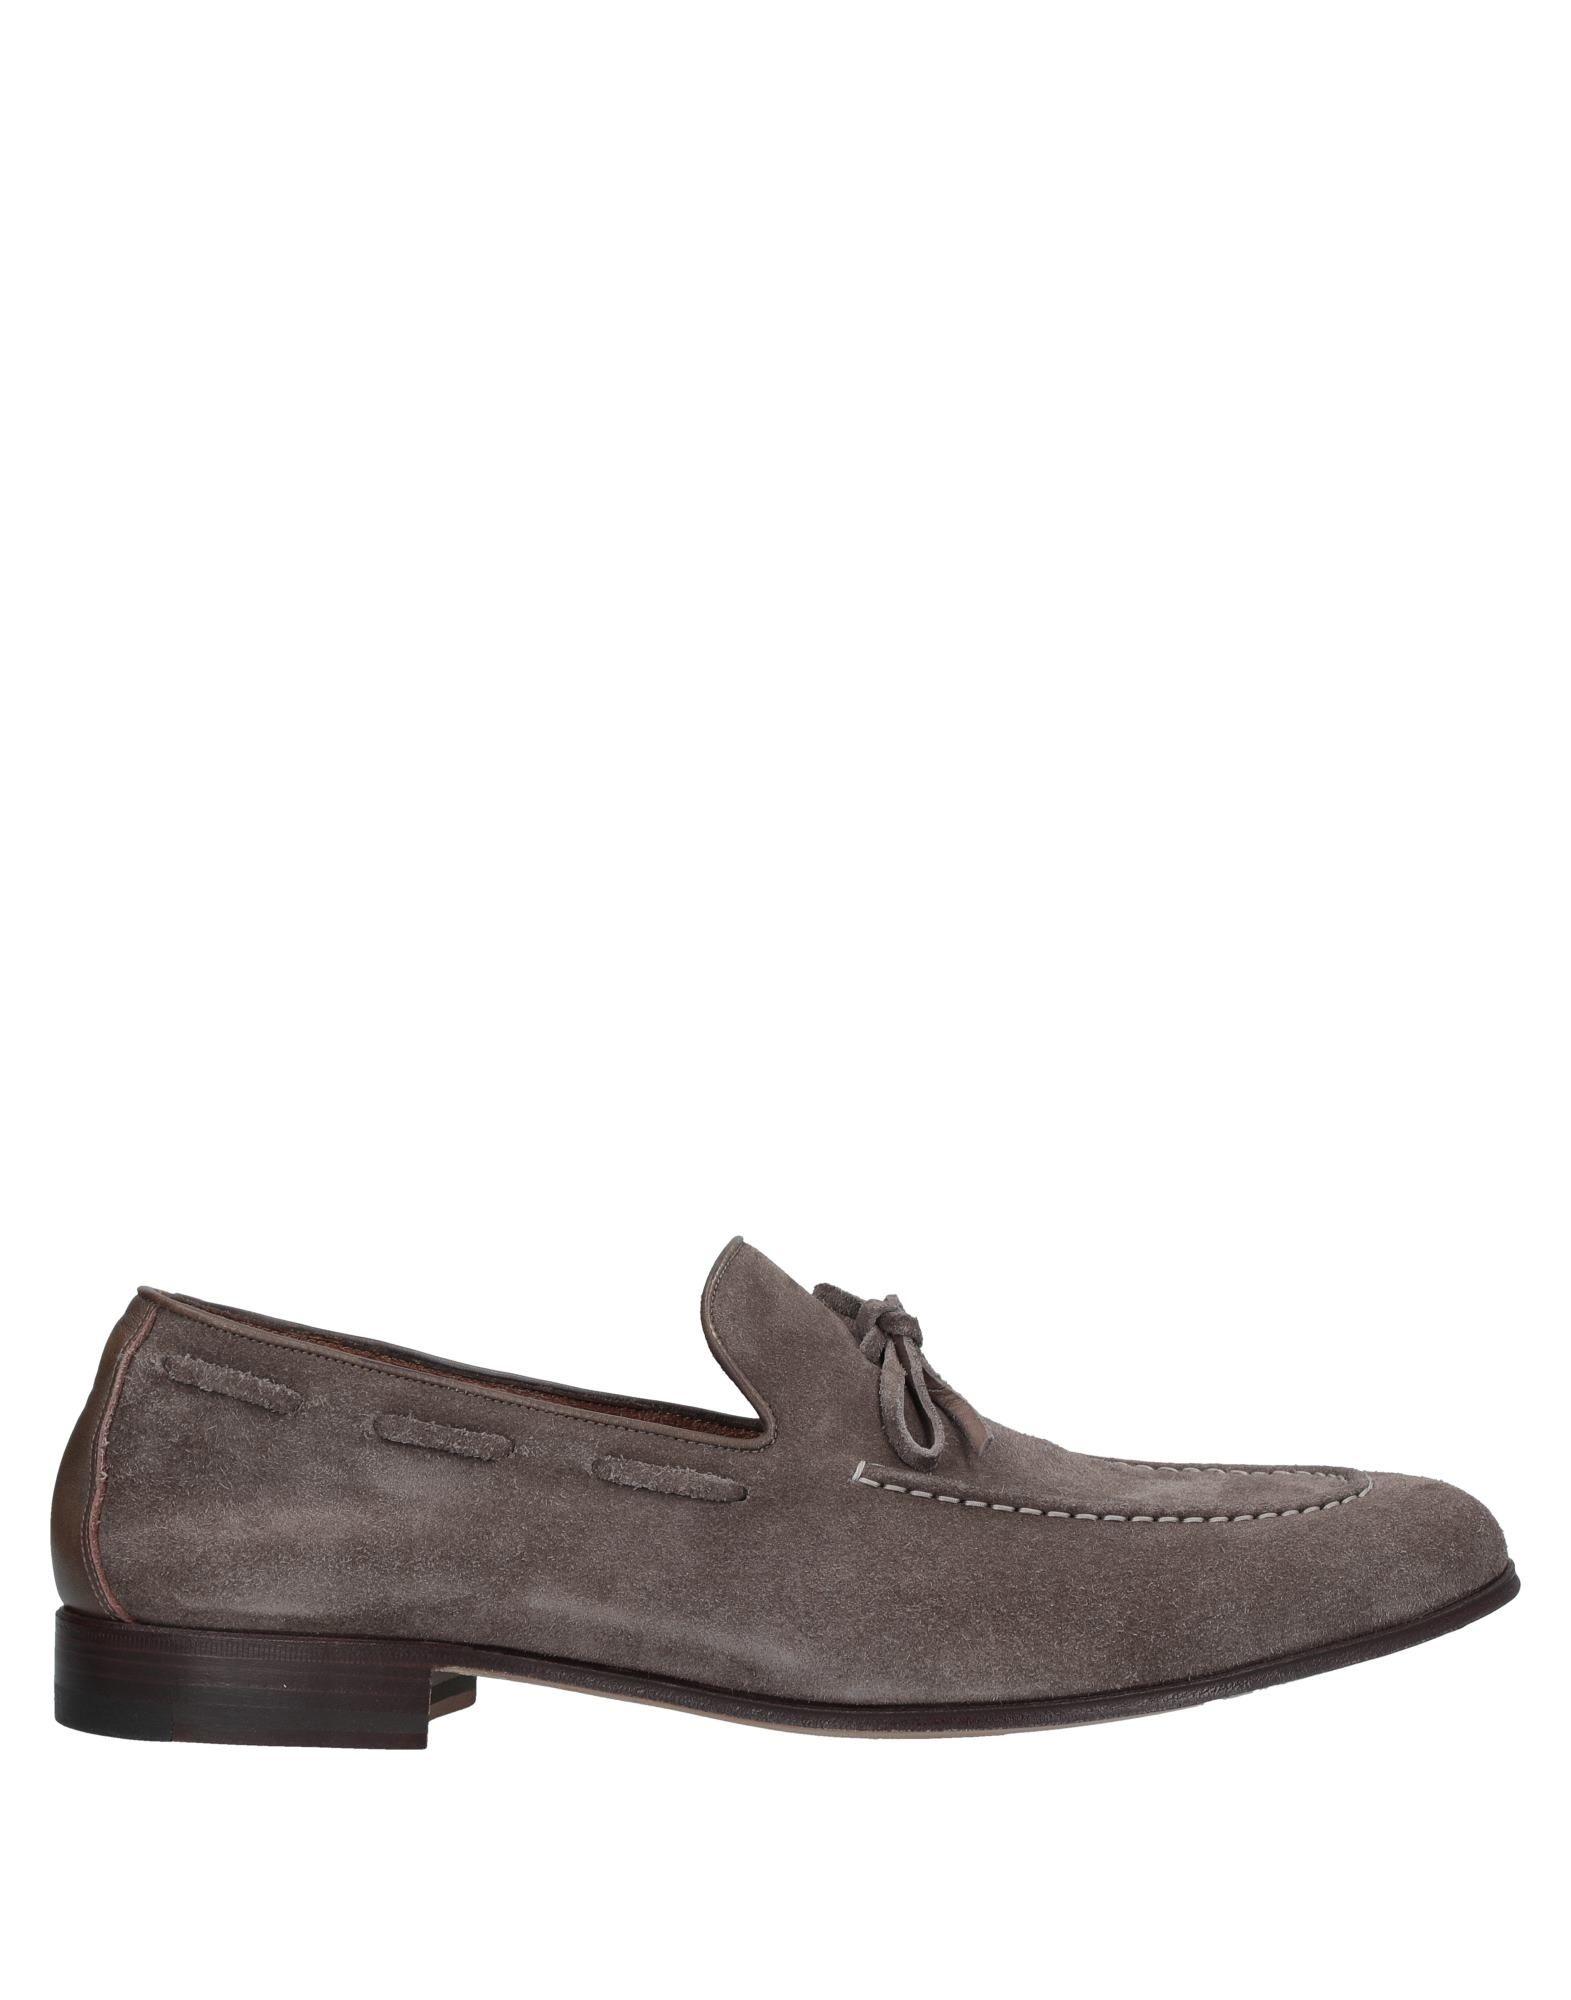 Botti Mokassins Herren  11536945PE Gute Qualität beliebte Schuhe